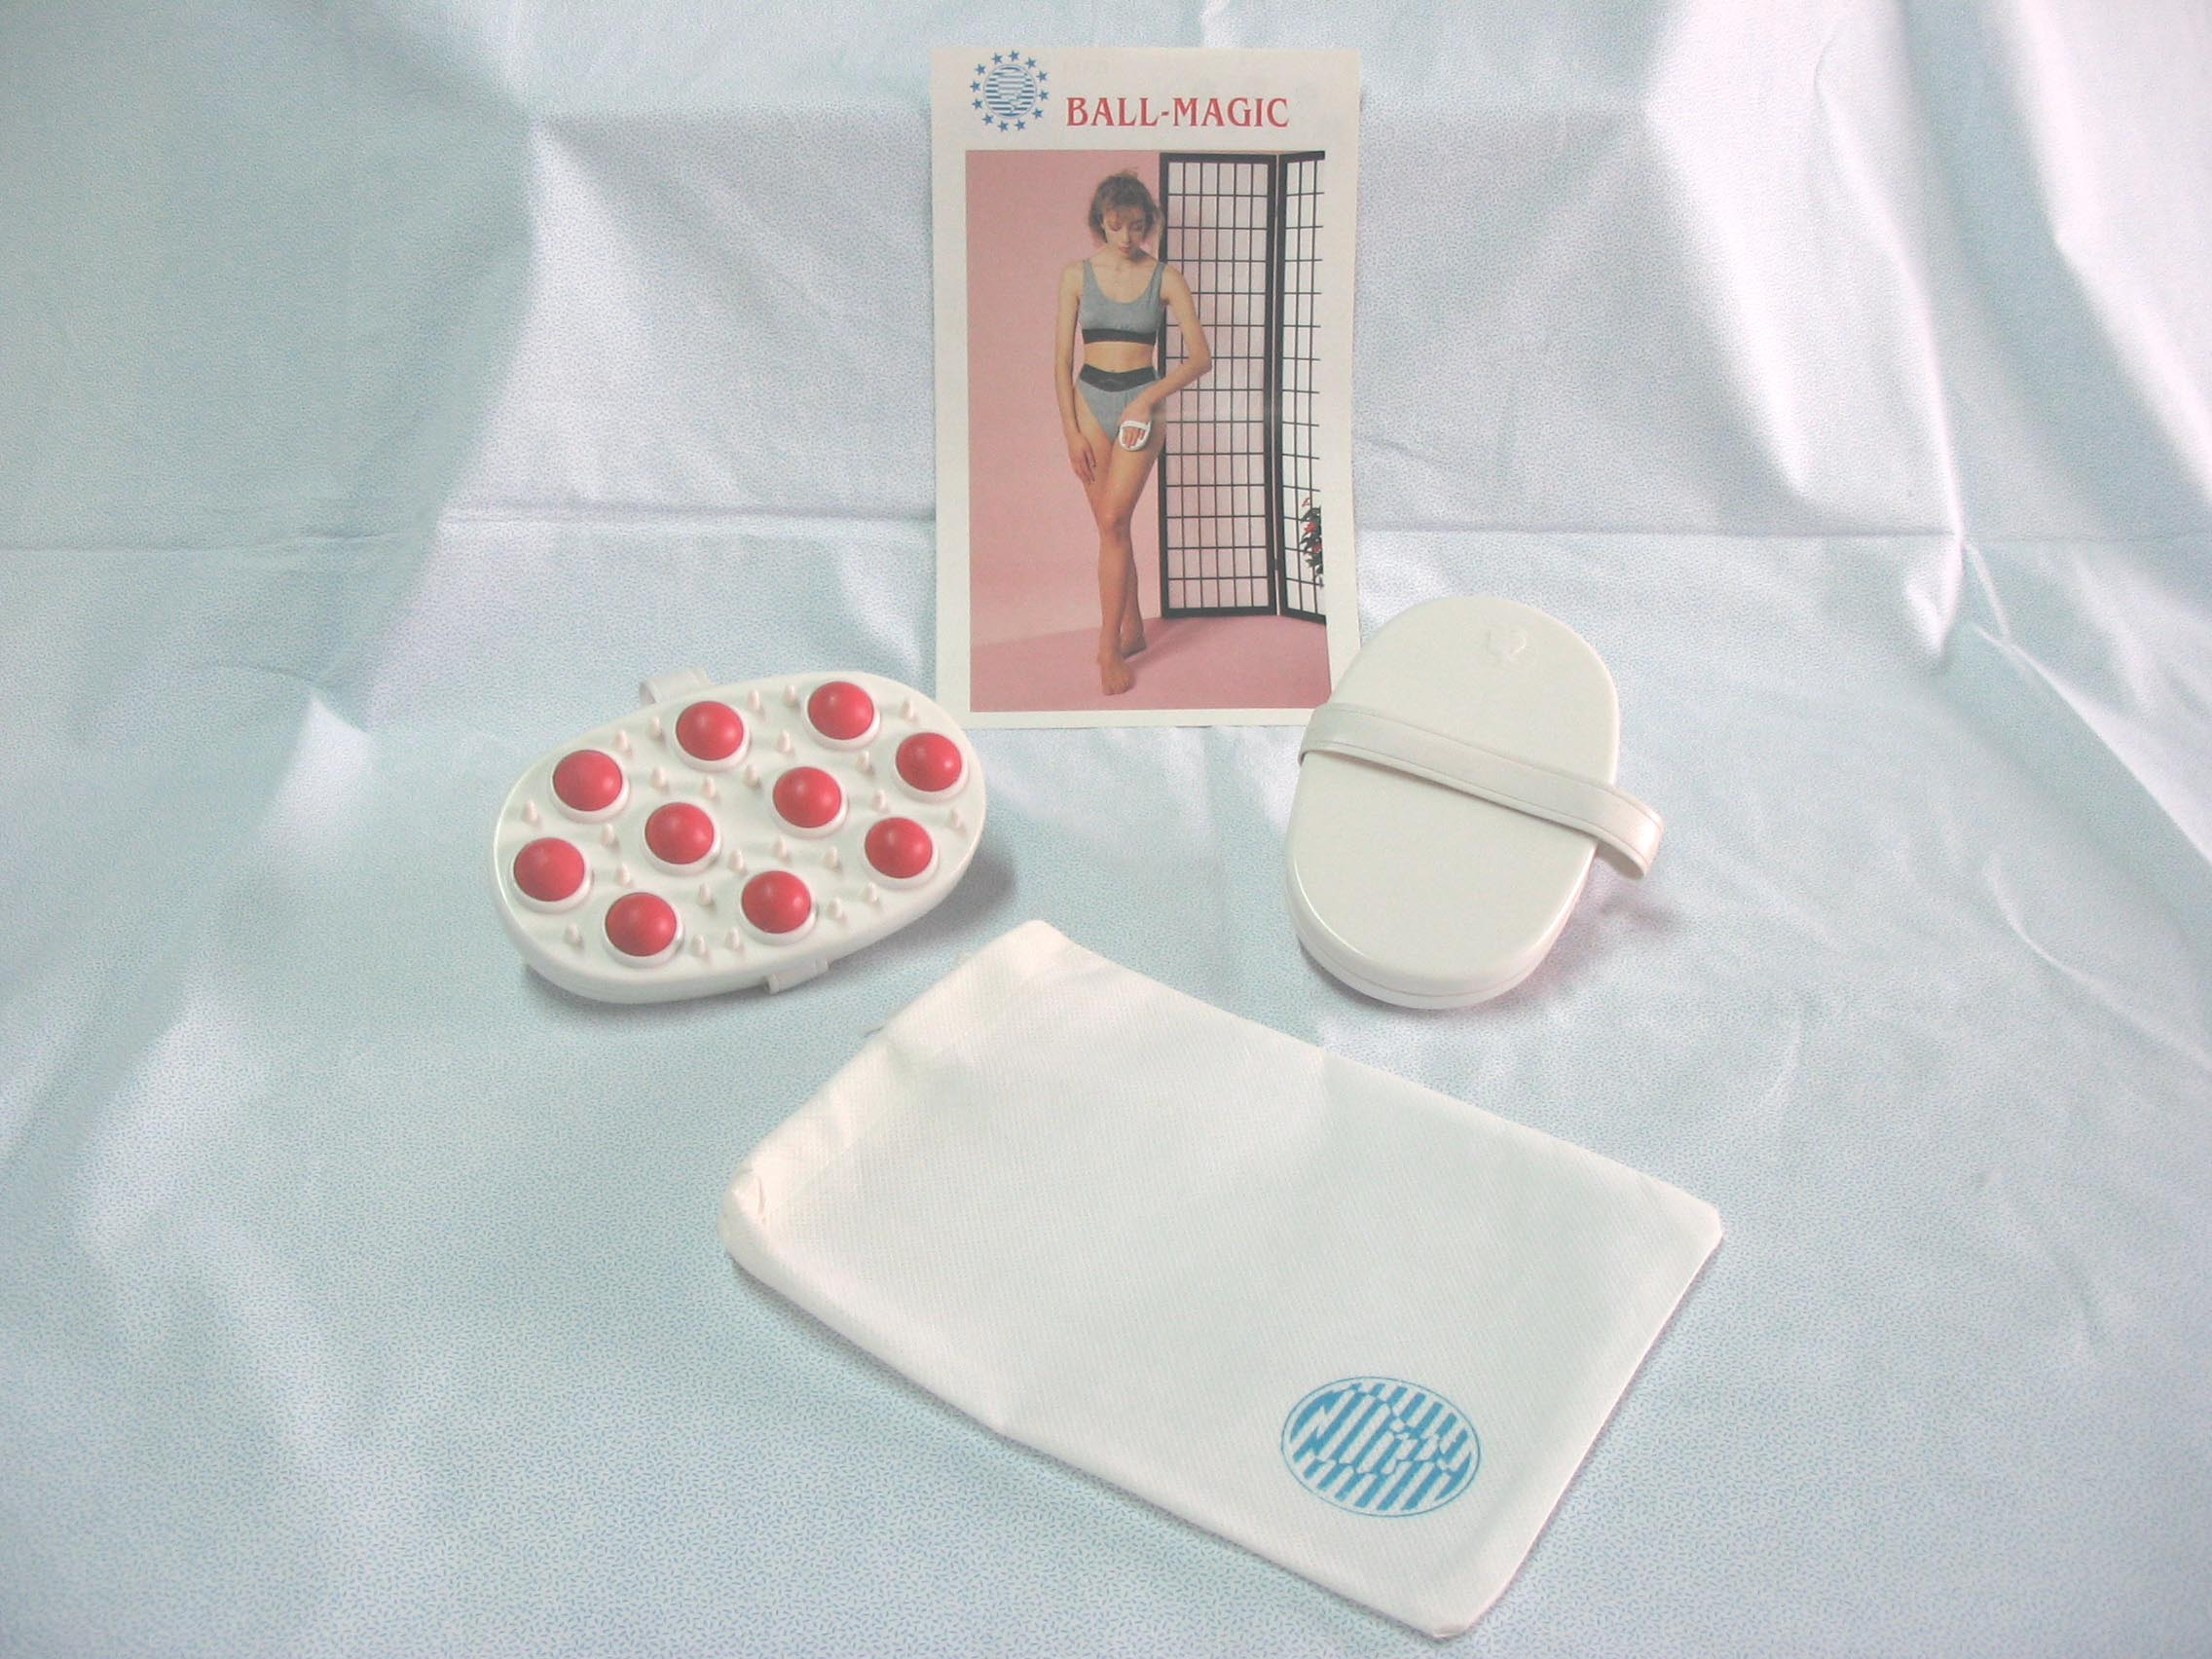 ball magic massageroller massageger t gegen cellulite. Black Bedroom Furniture Sets. Home Design Ideas